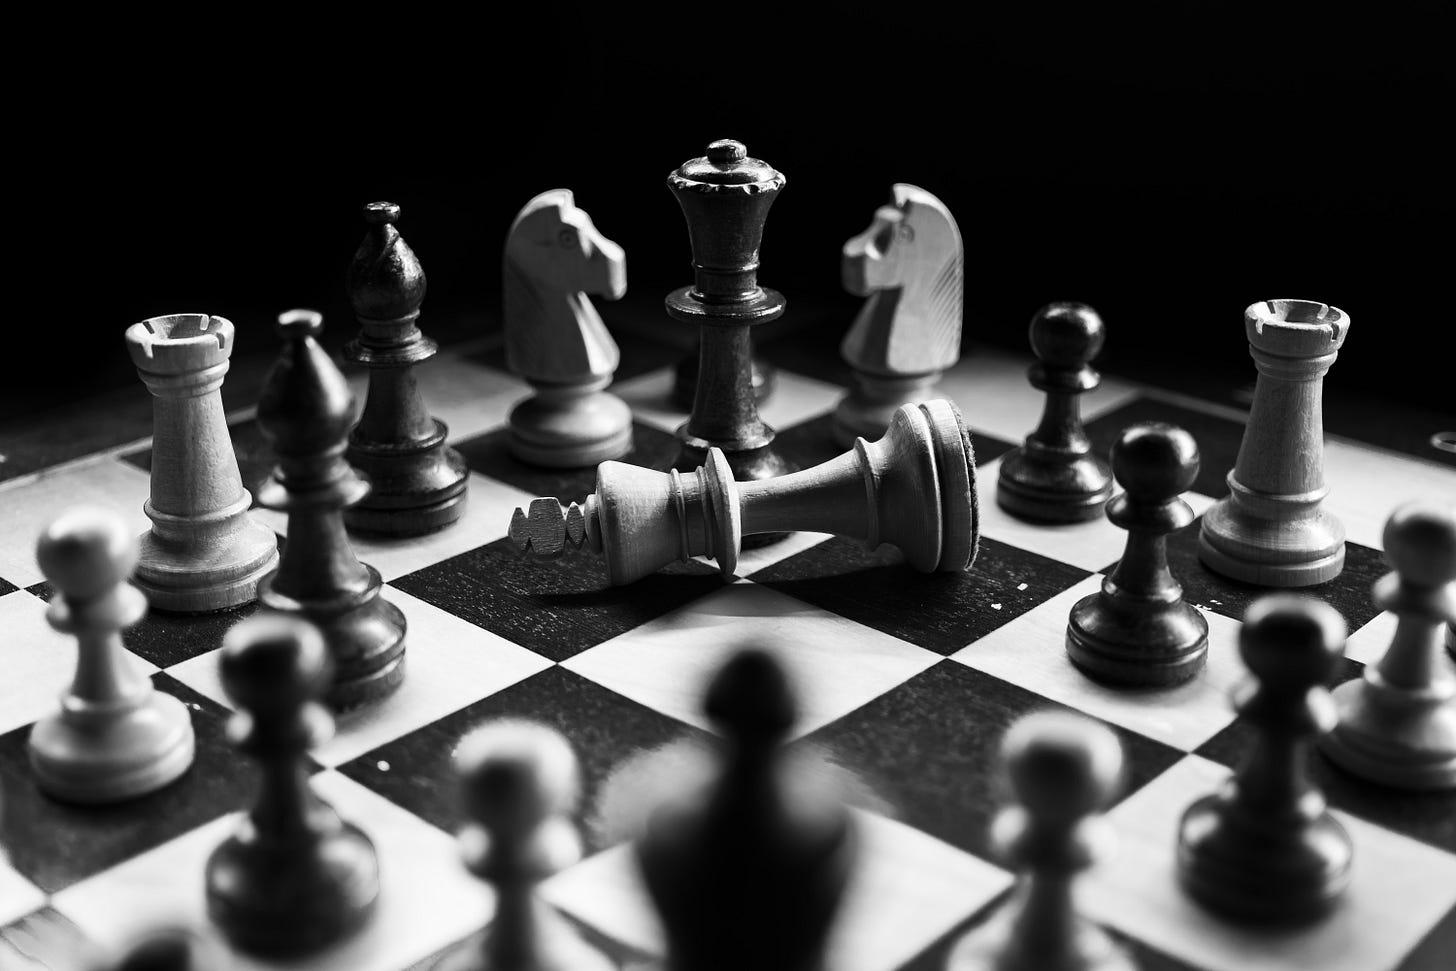 Photo of a chessboard. Felit Mittermeier / Unsplash